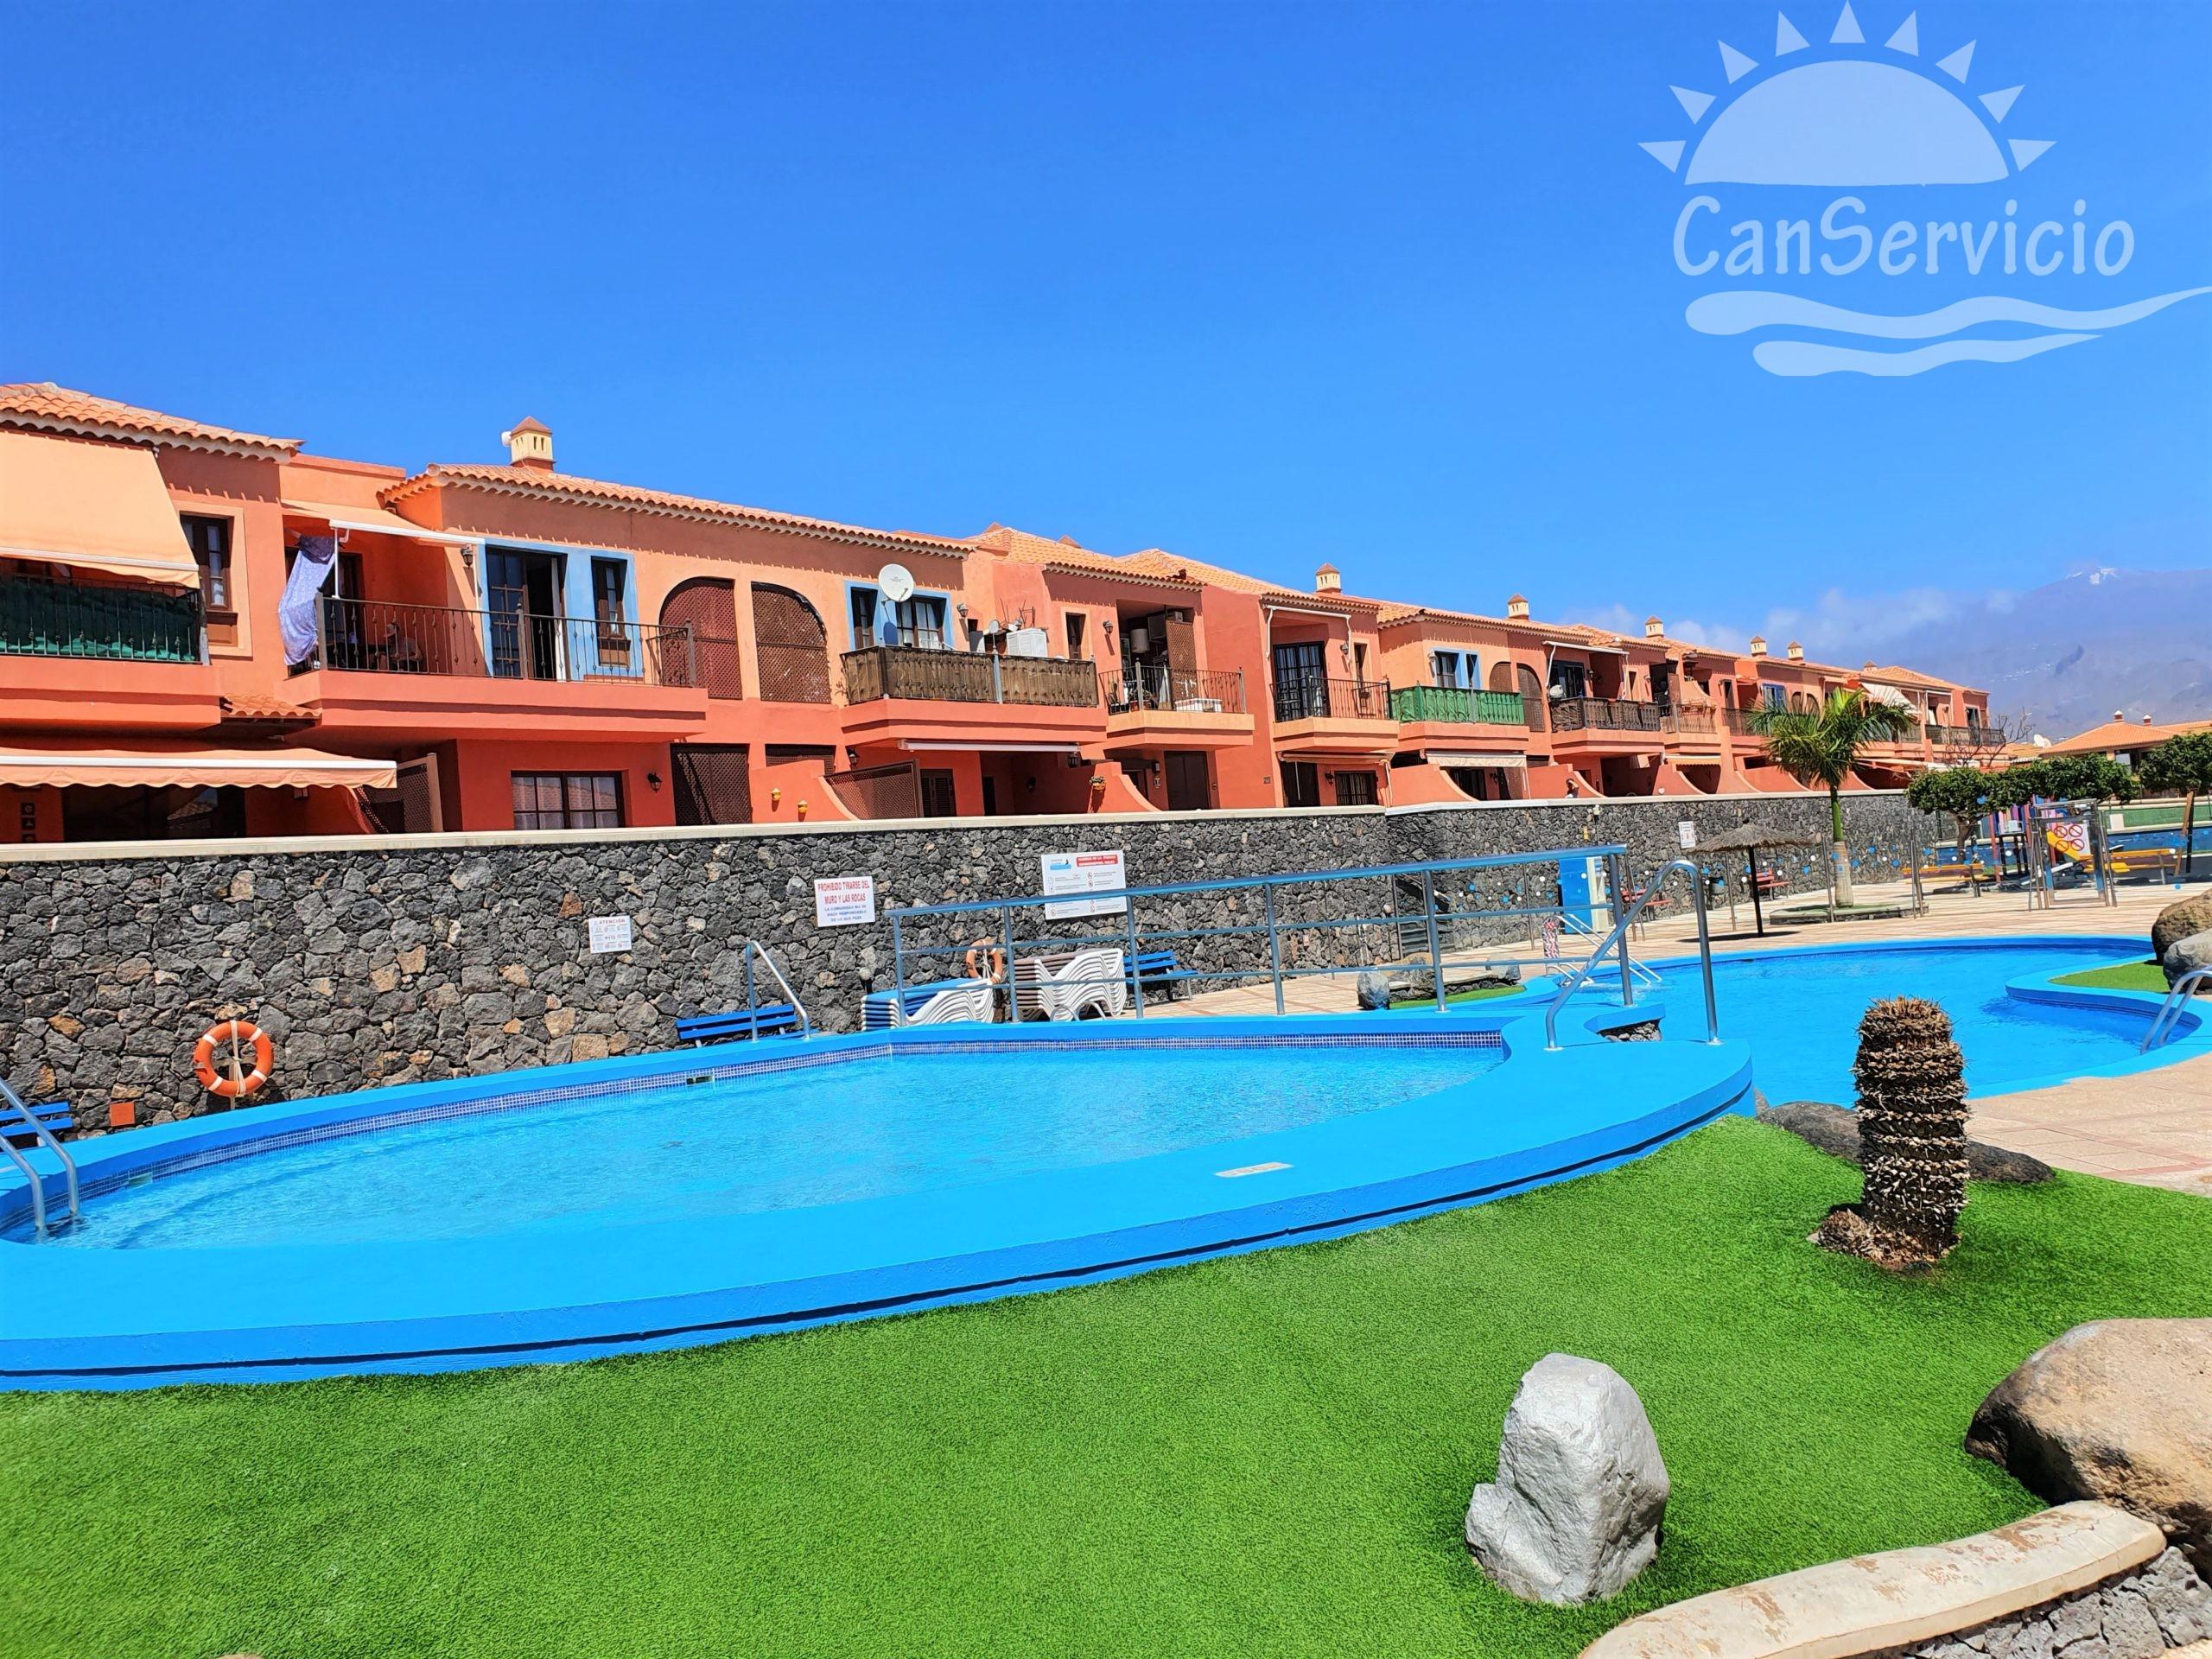 Apartment in Residencial Atlantico, Tenerife - Canservicio